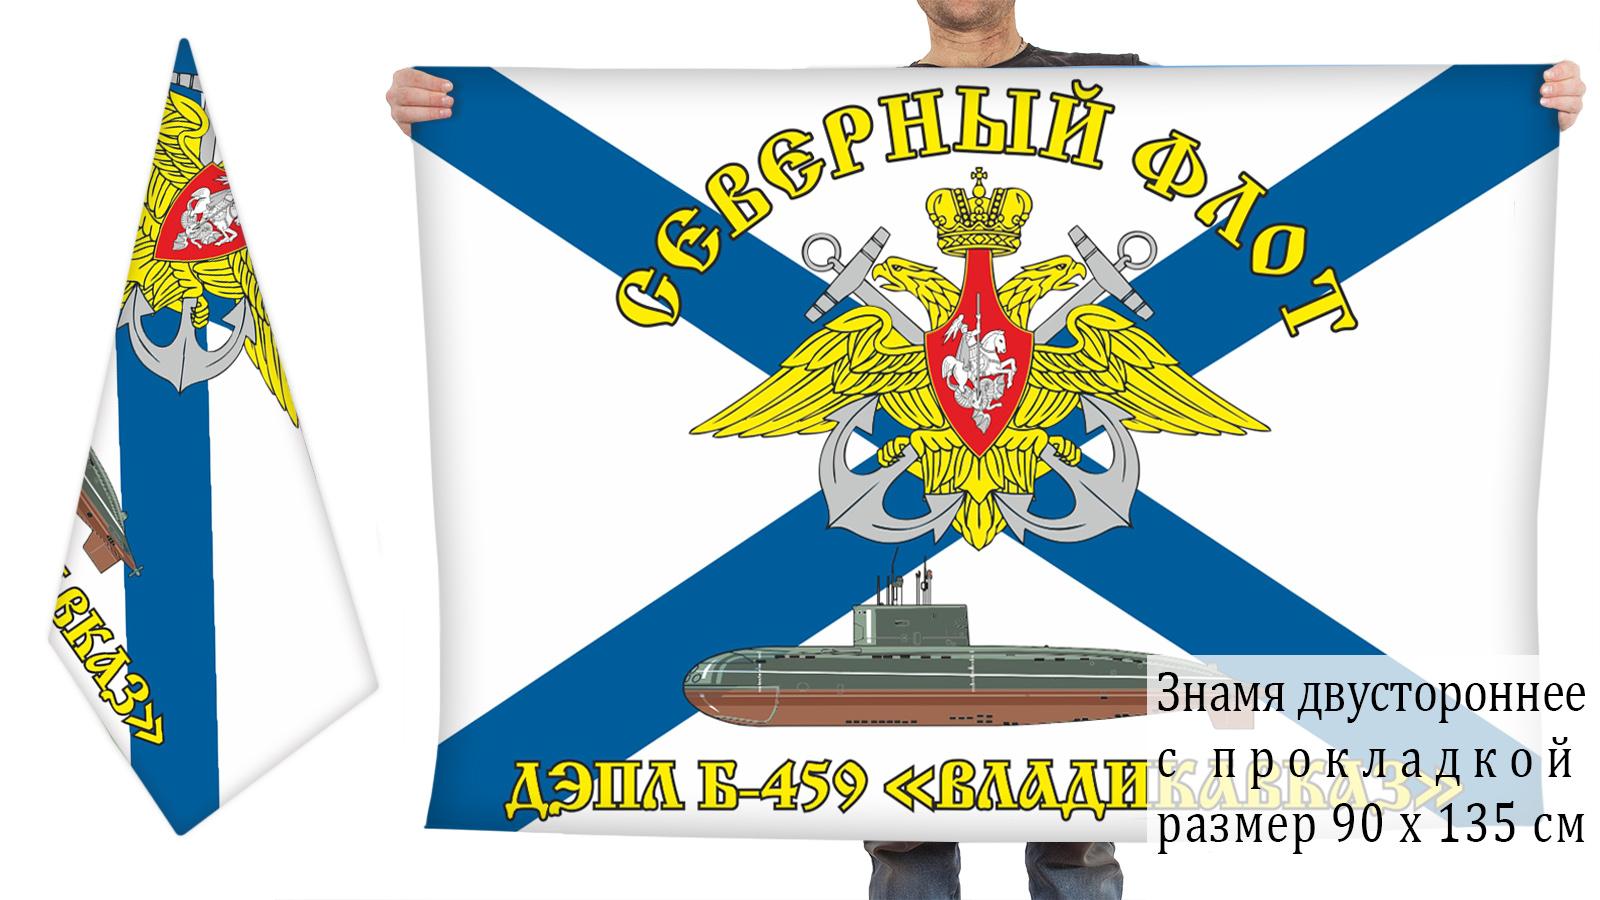 Недорогие флаги ВМФ Б-459 Владикавказ